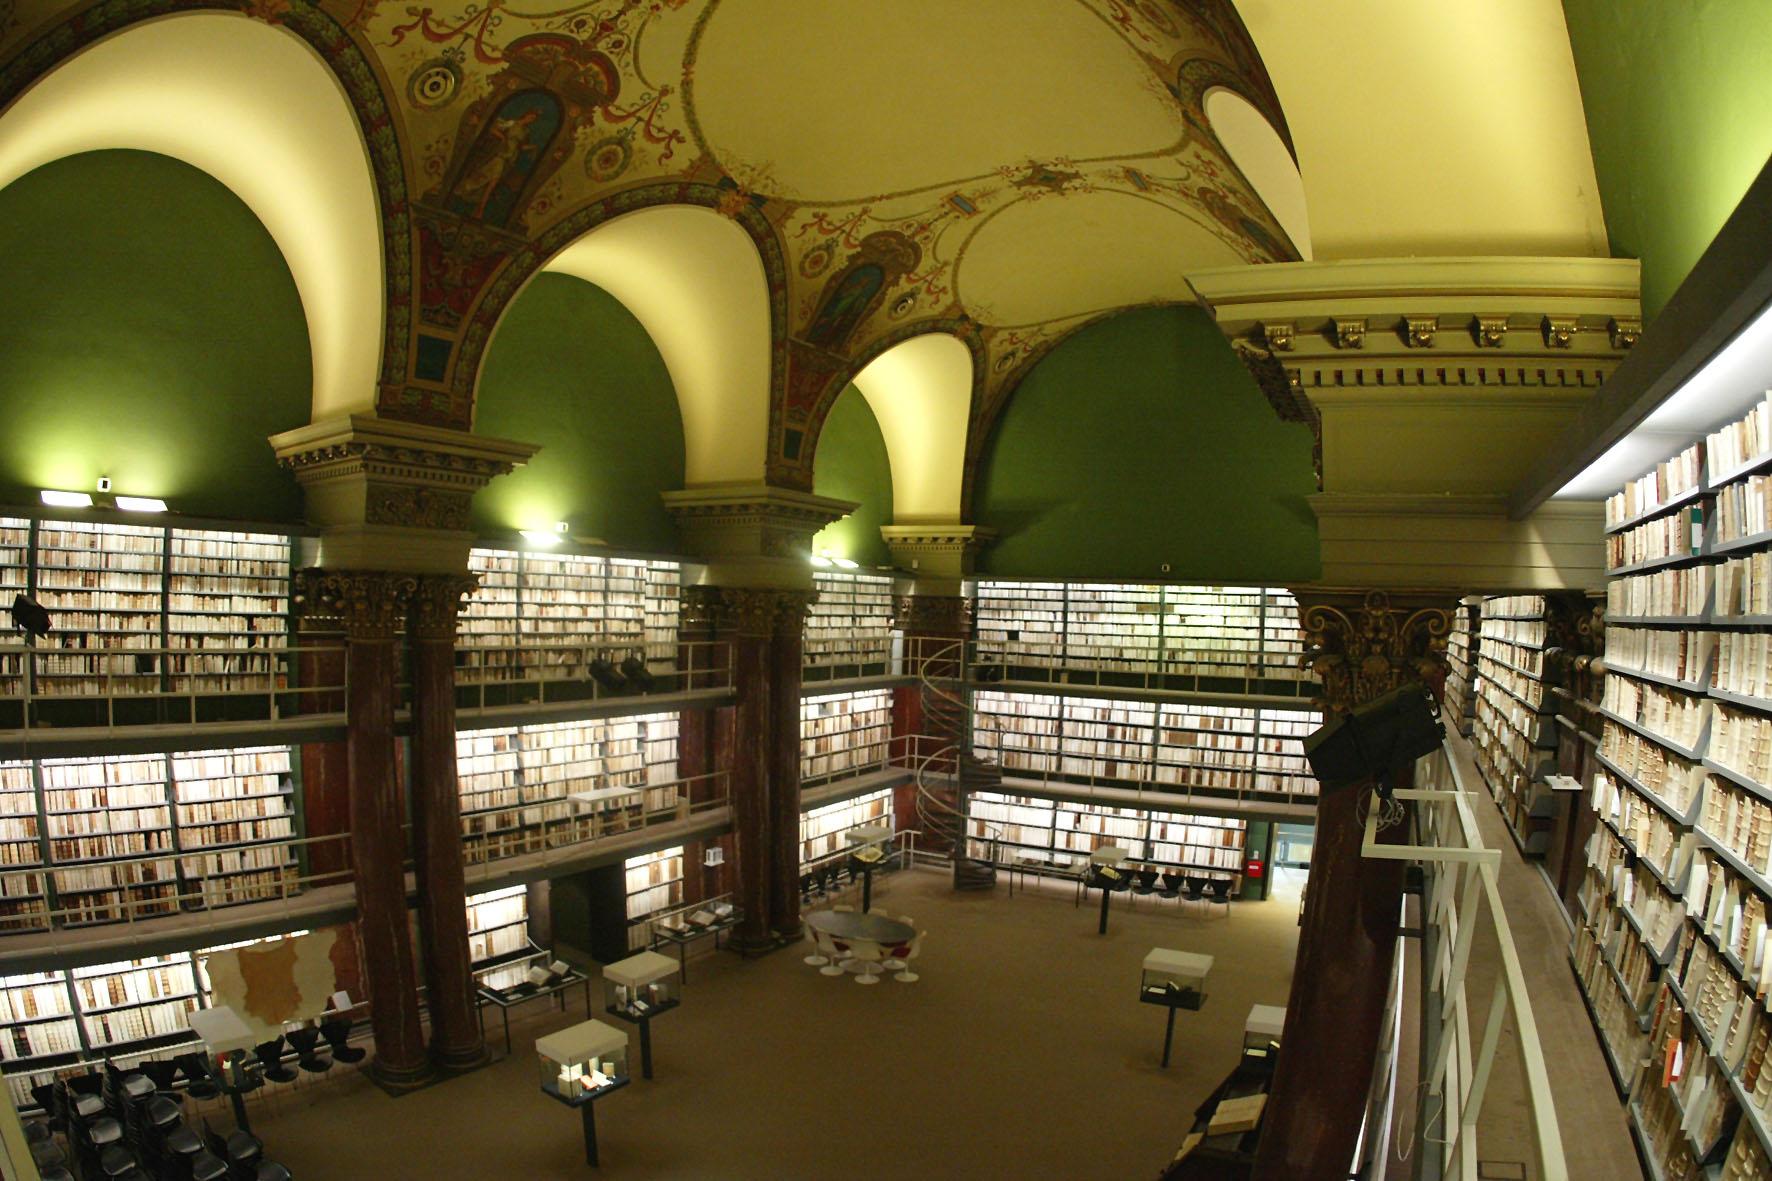 Herzog August Library, Wolfenbüttel, Germany